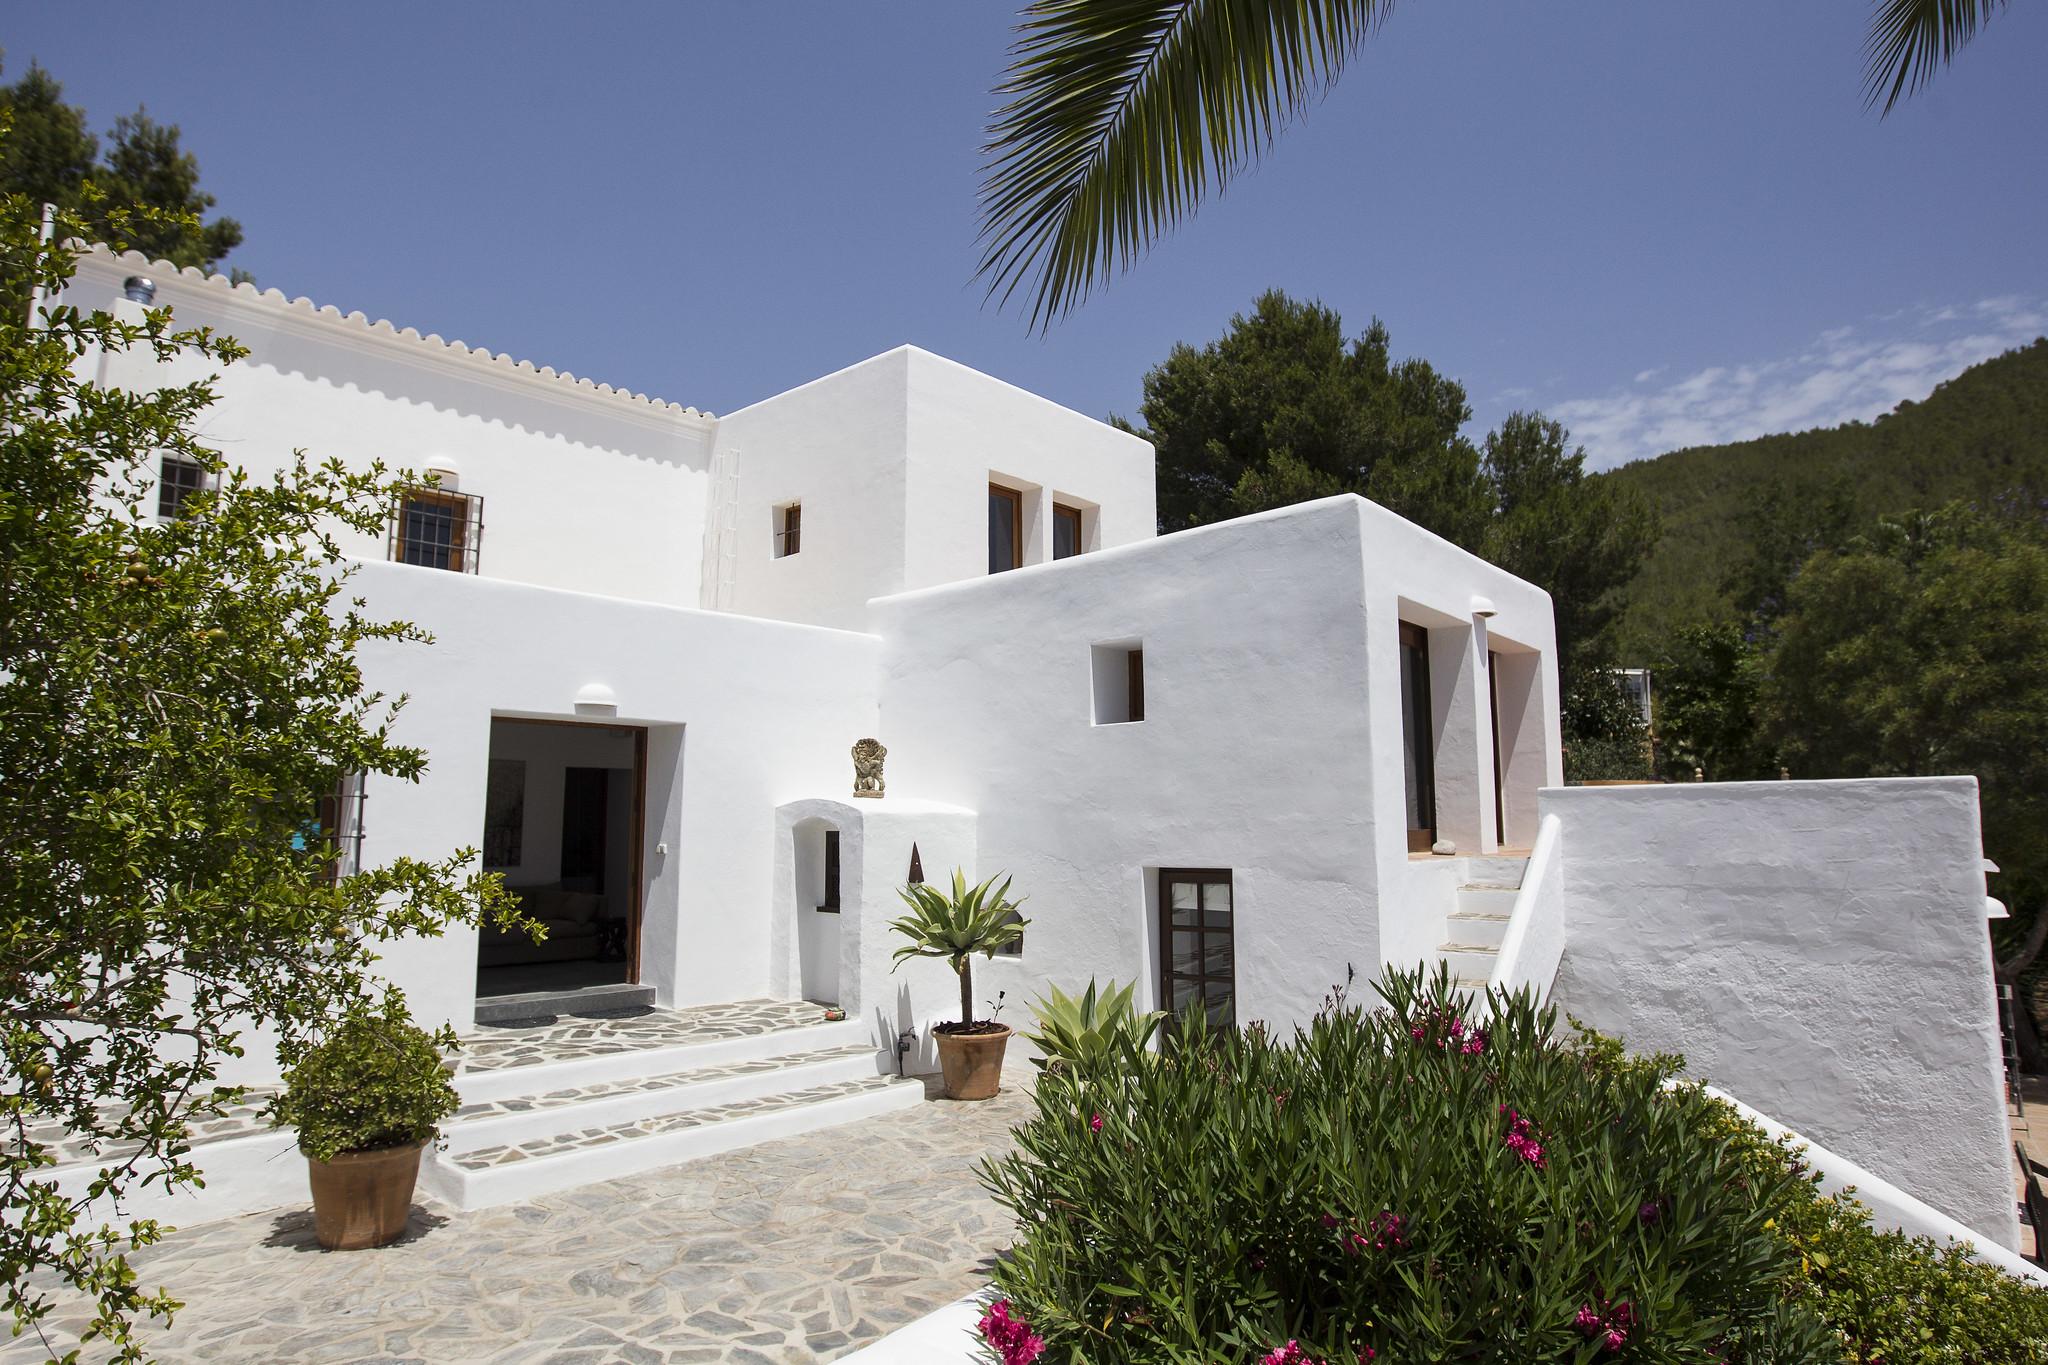 https://www.white-ibiza.com/wp-content/uploads/2020/05/white-ibiza-villas-can-lyra-exterior2.jpg